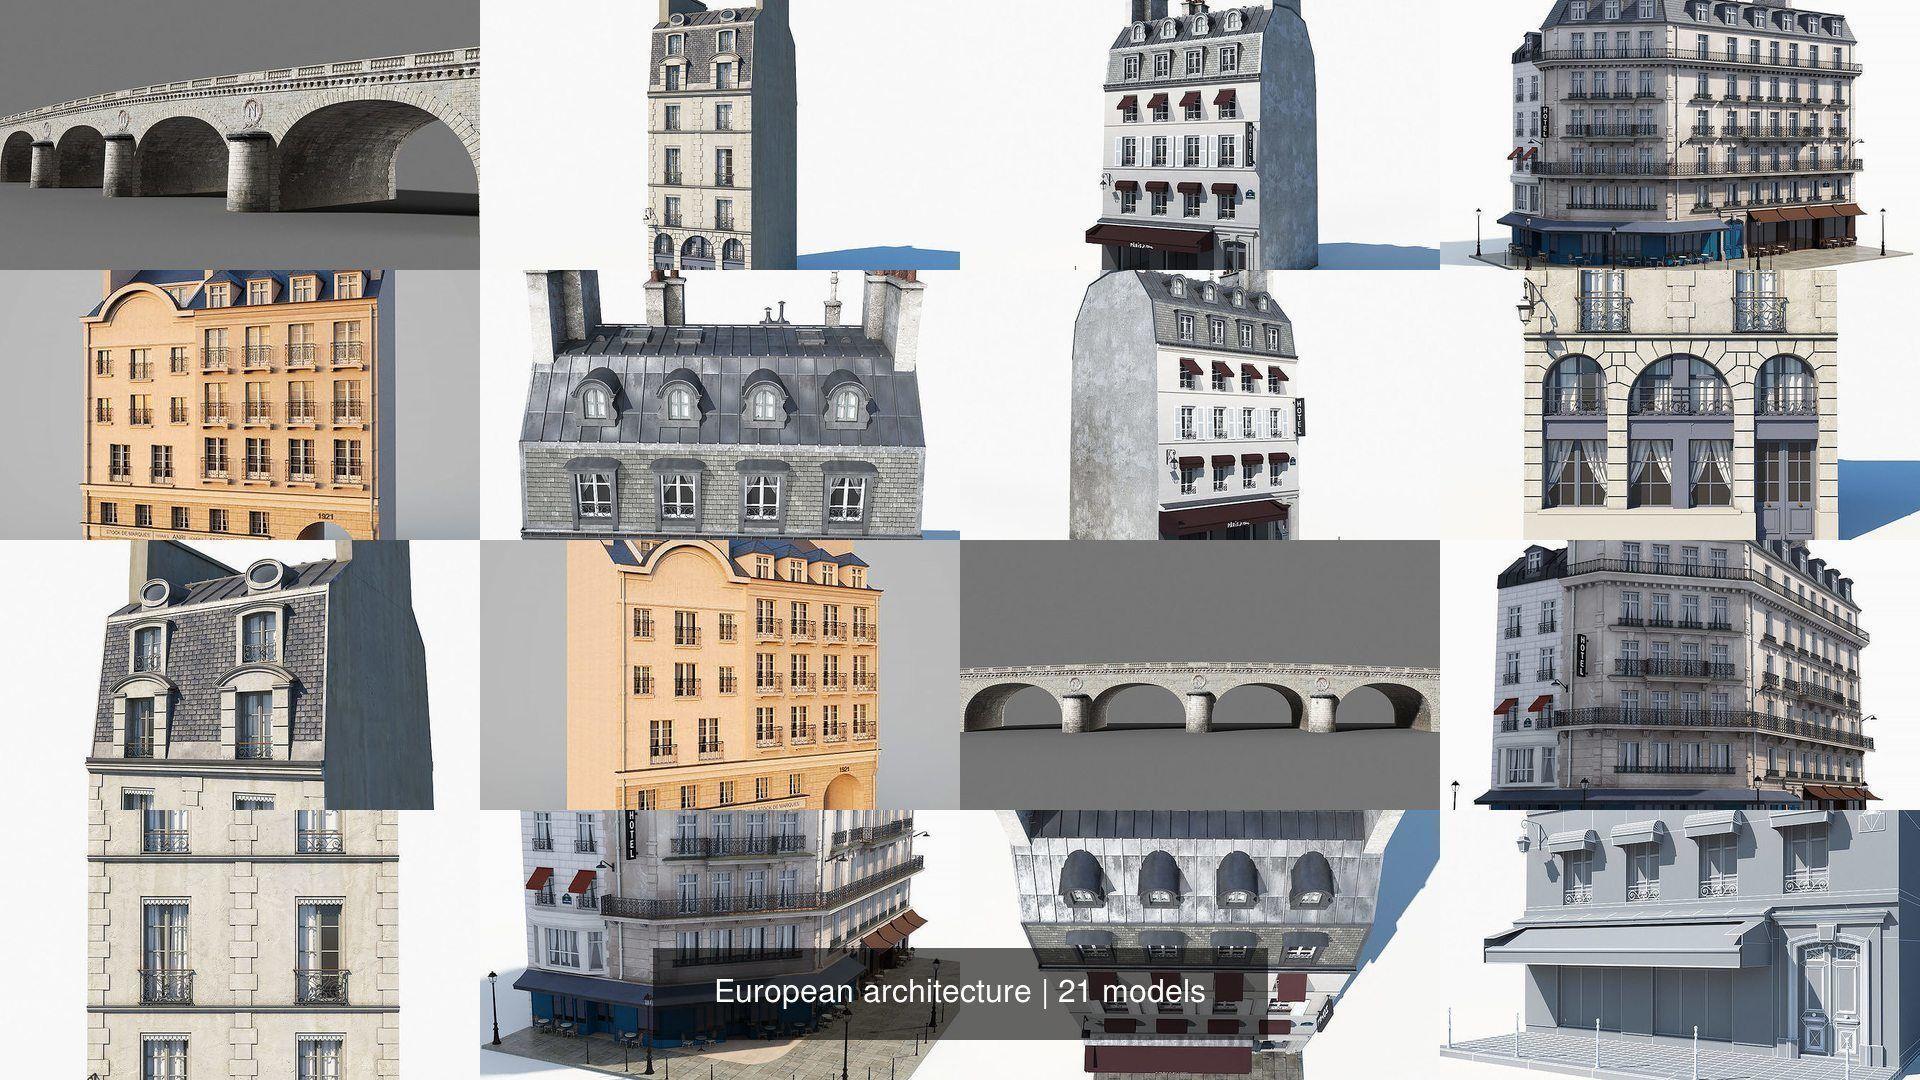 European architecture